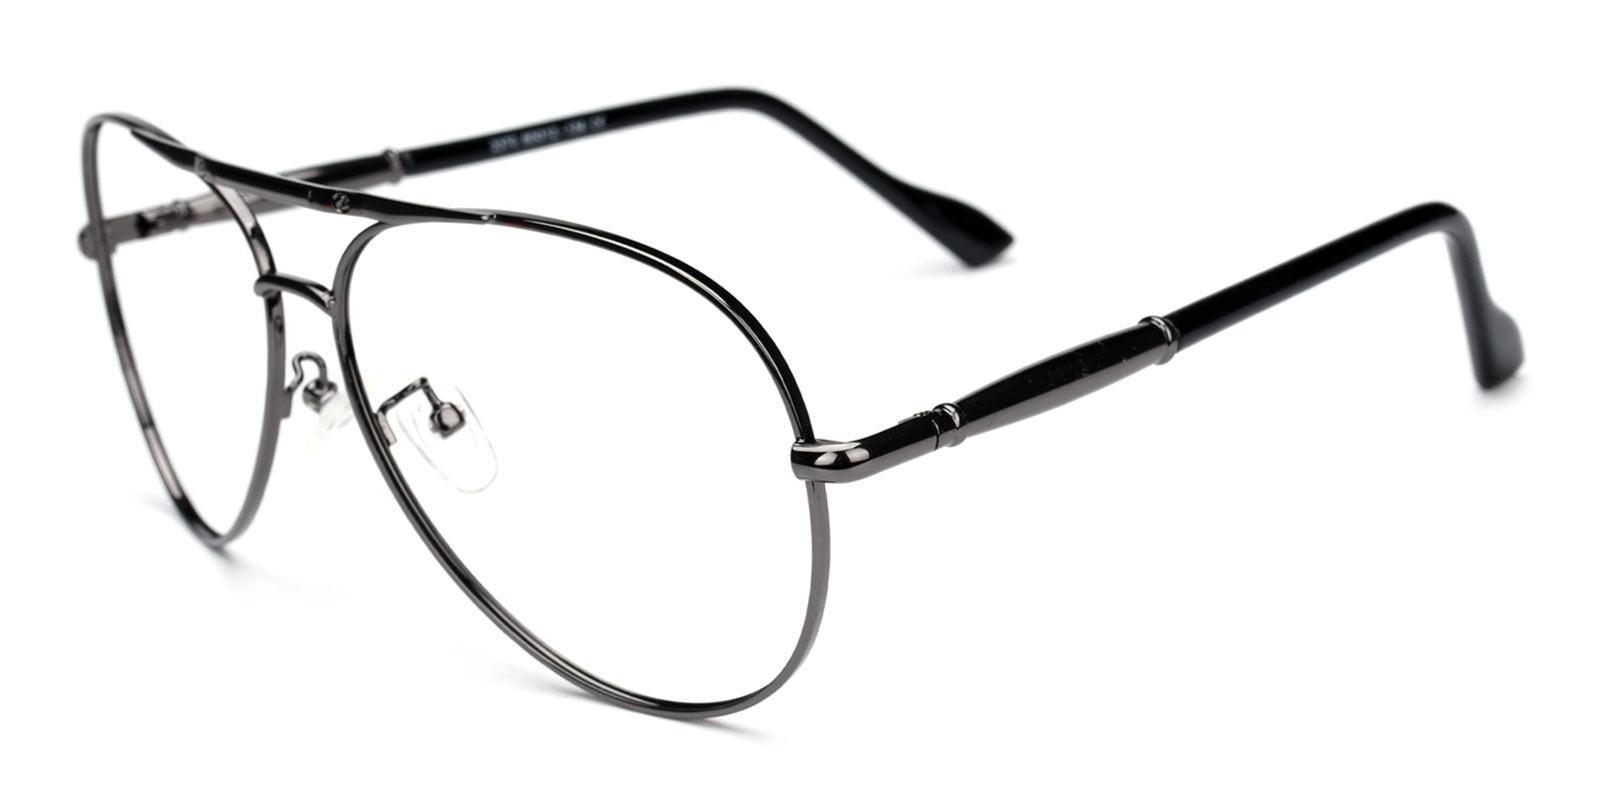 Riva-Gun-Aviator-Metal-Eyeglasses-detail